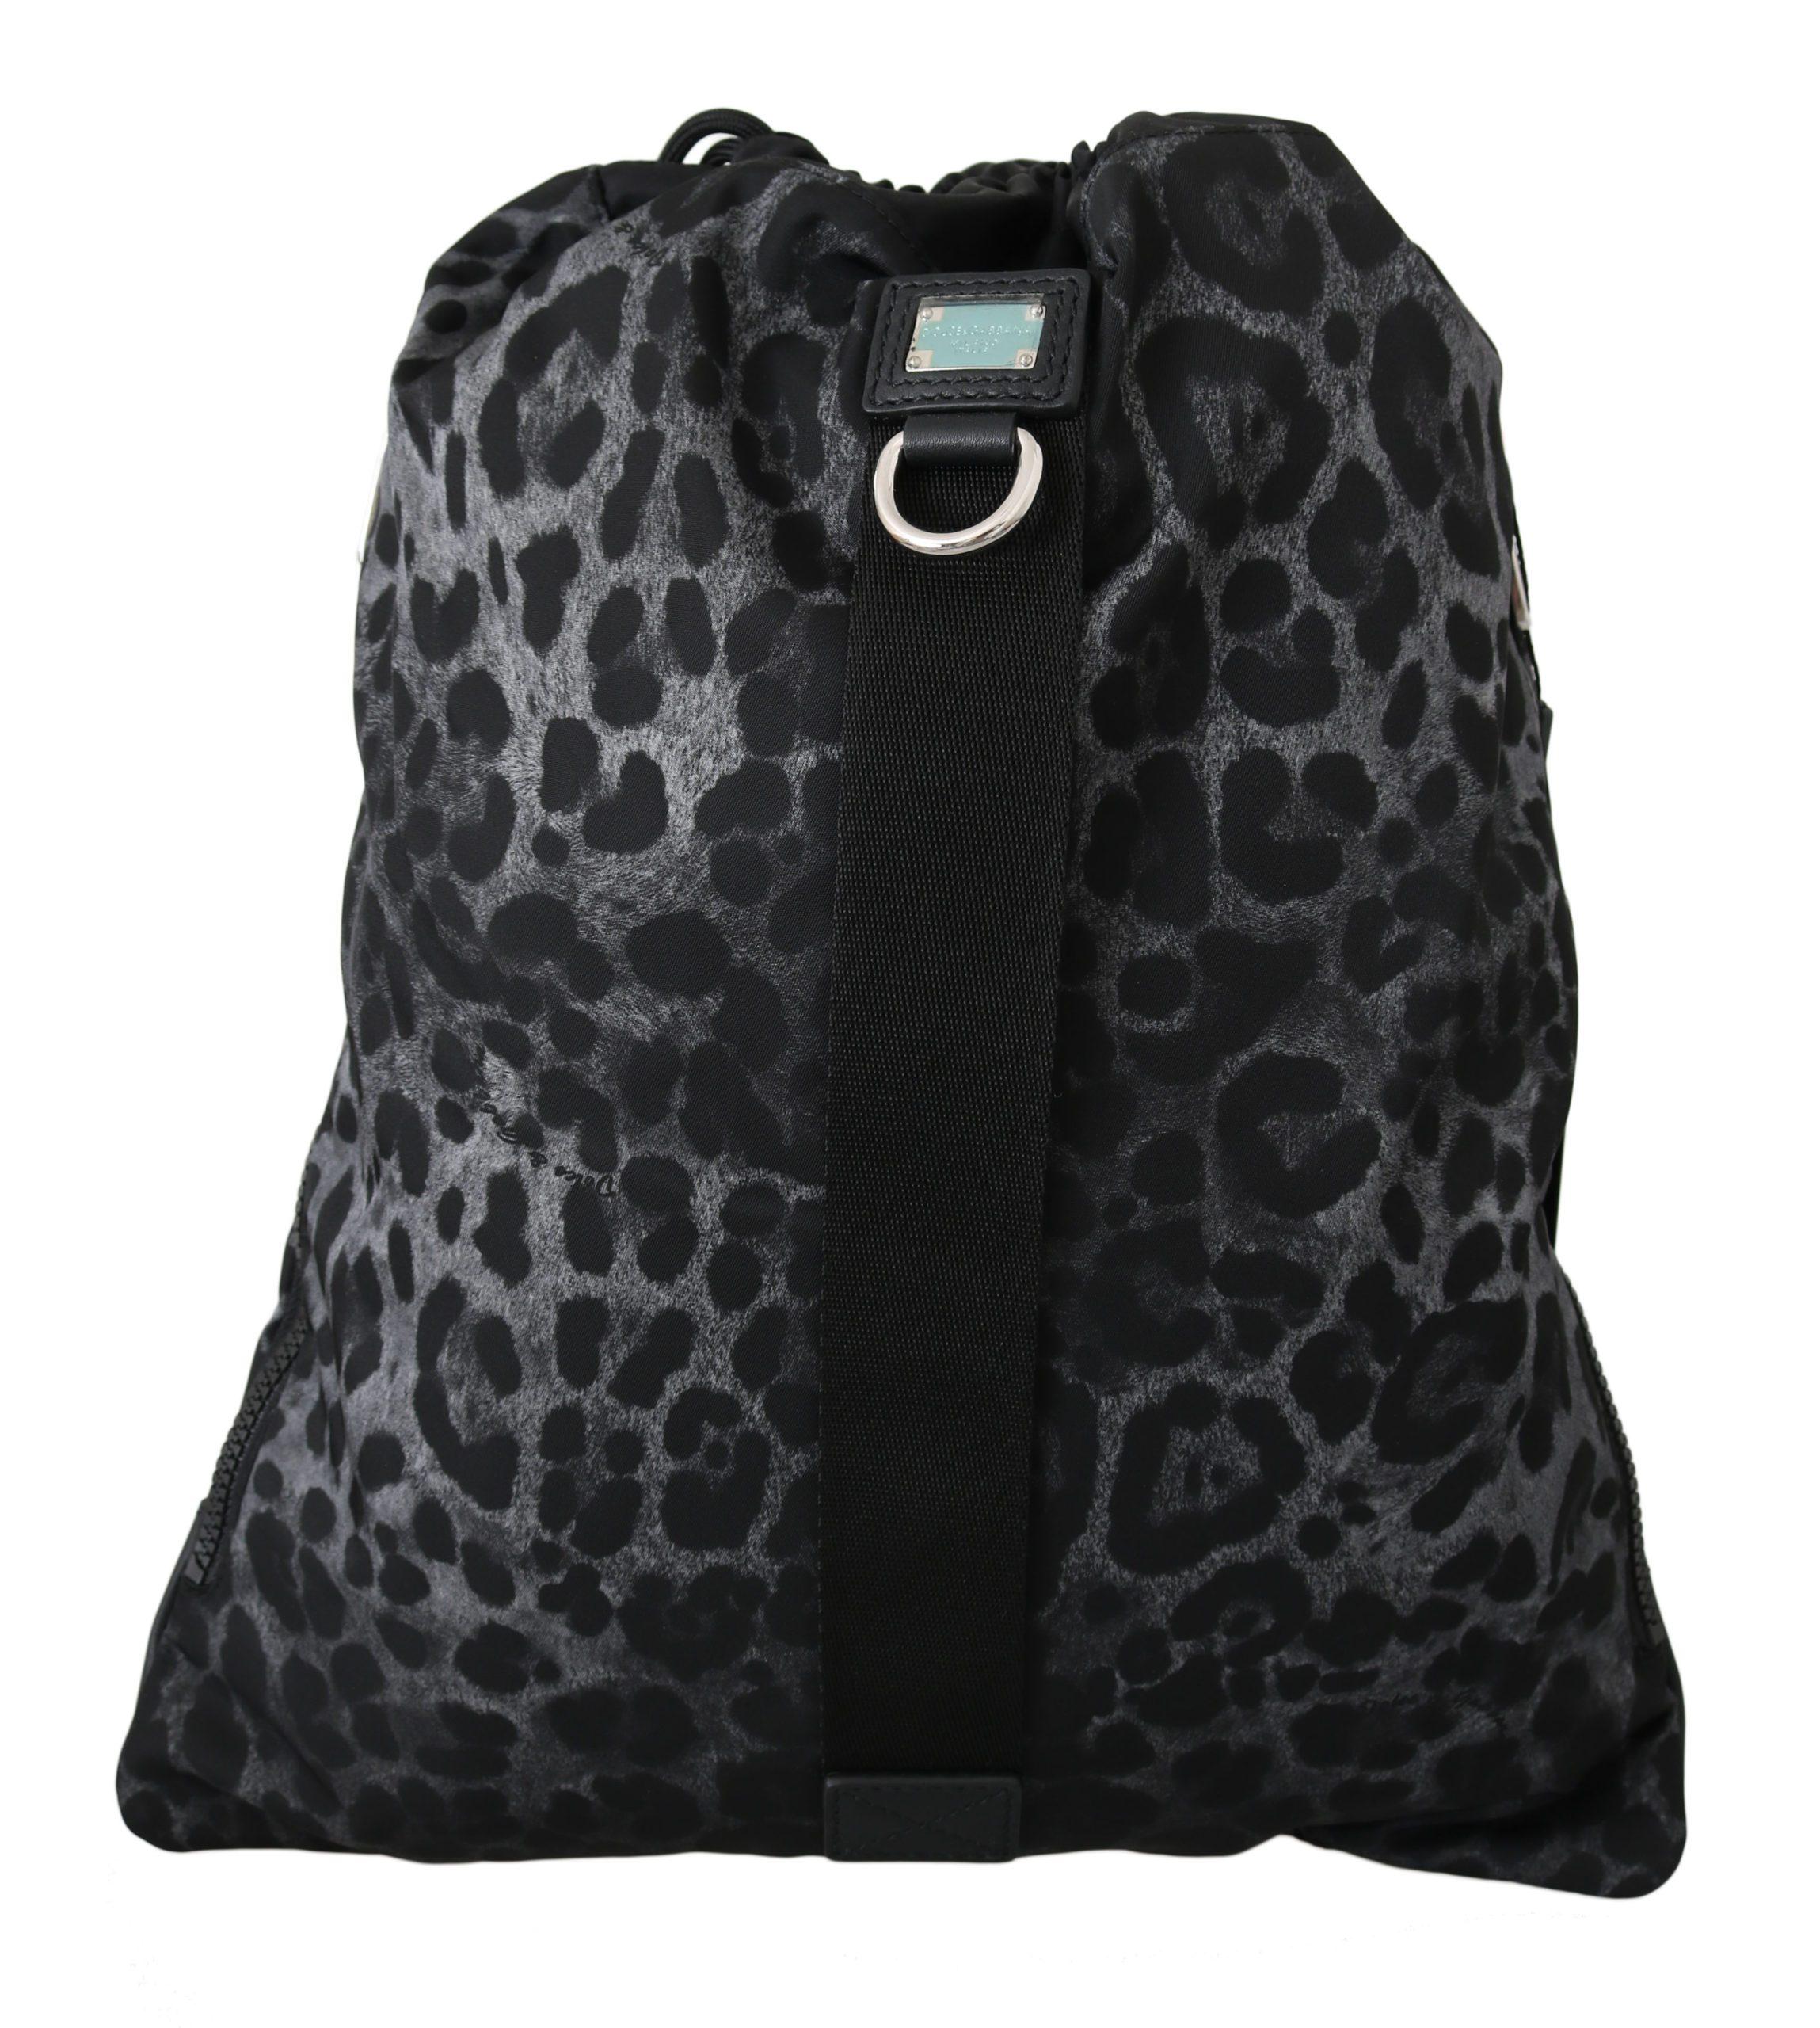 Dolce & Gabbana Men's Leopard Adjustable Nylon Backpack Multicolor VA8646